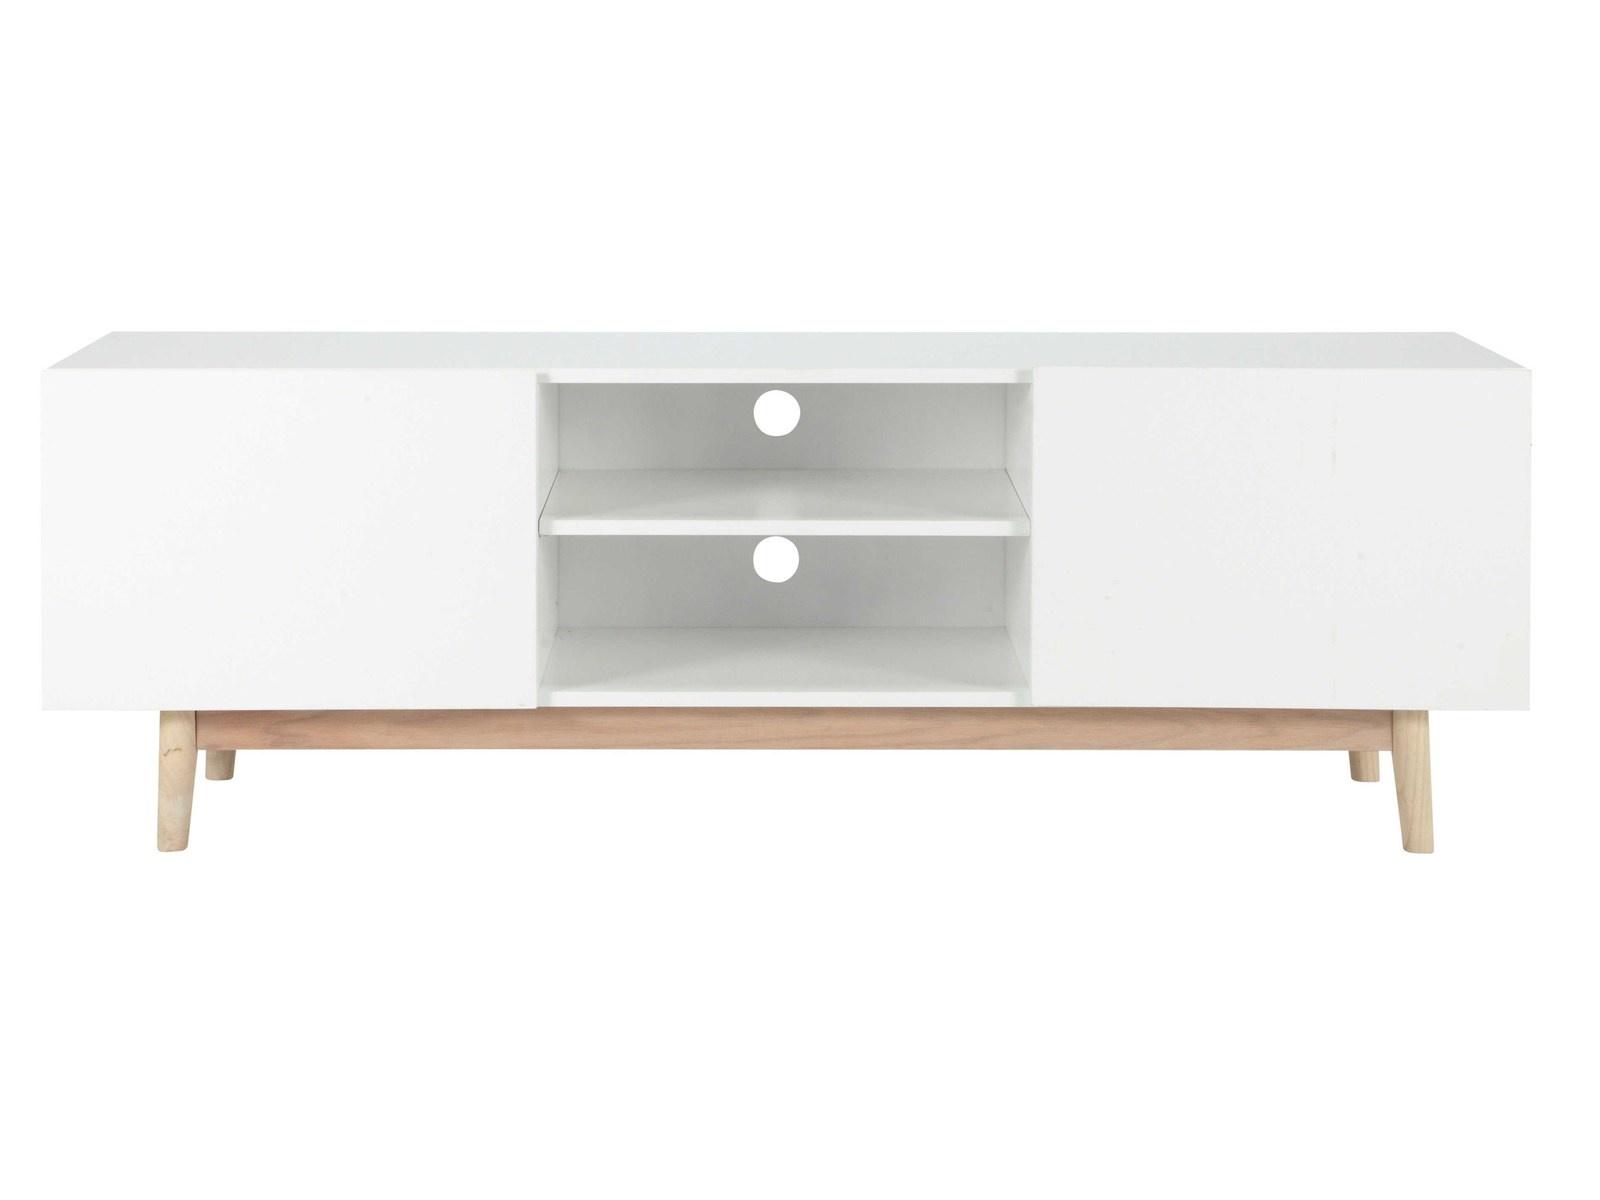 Pieds de meuble style scandinave